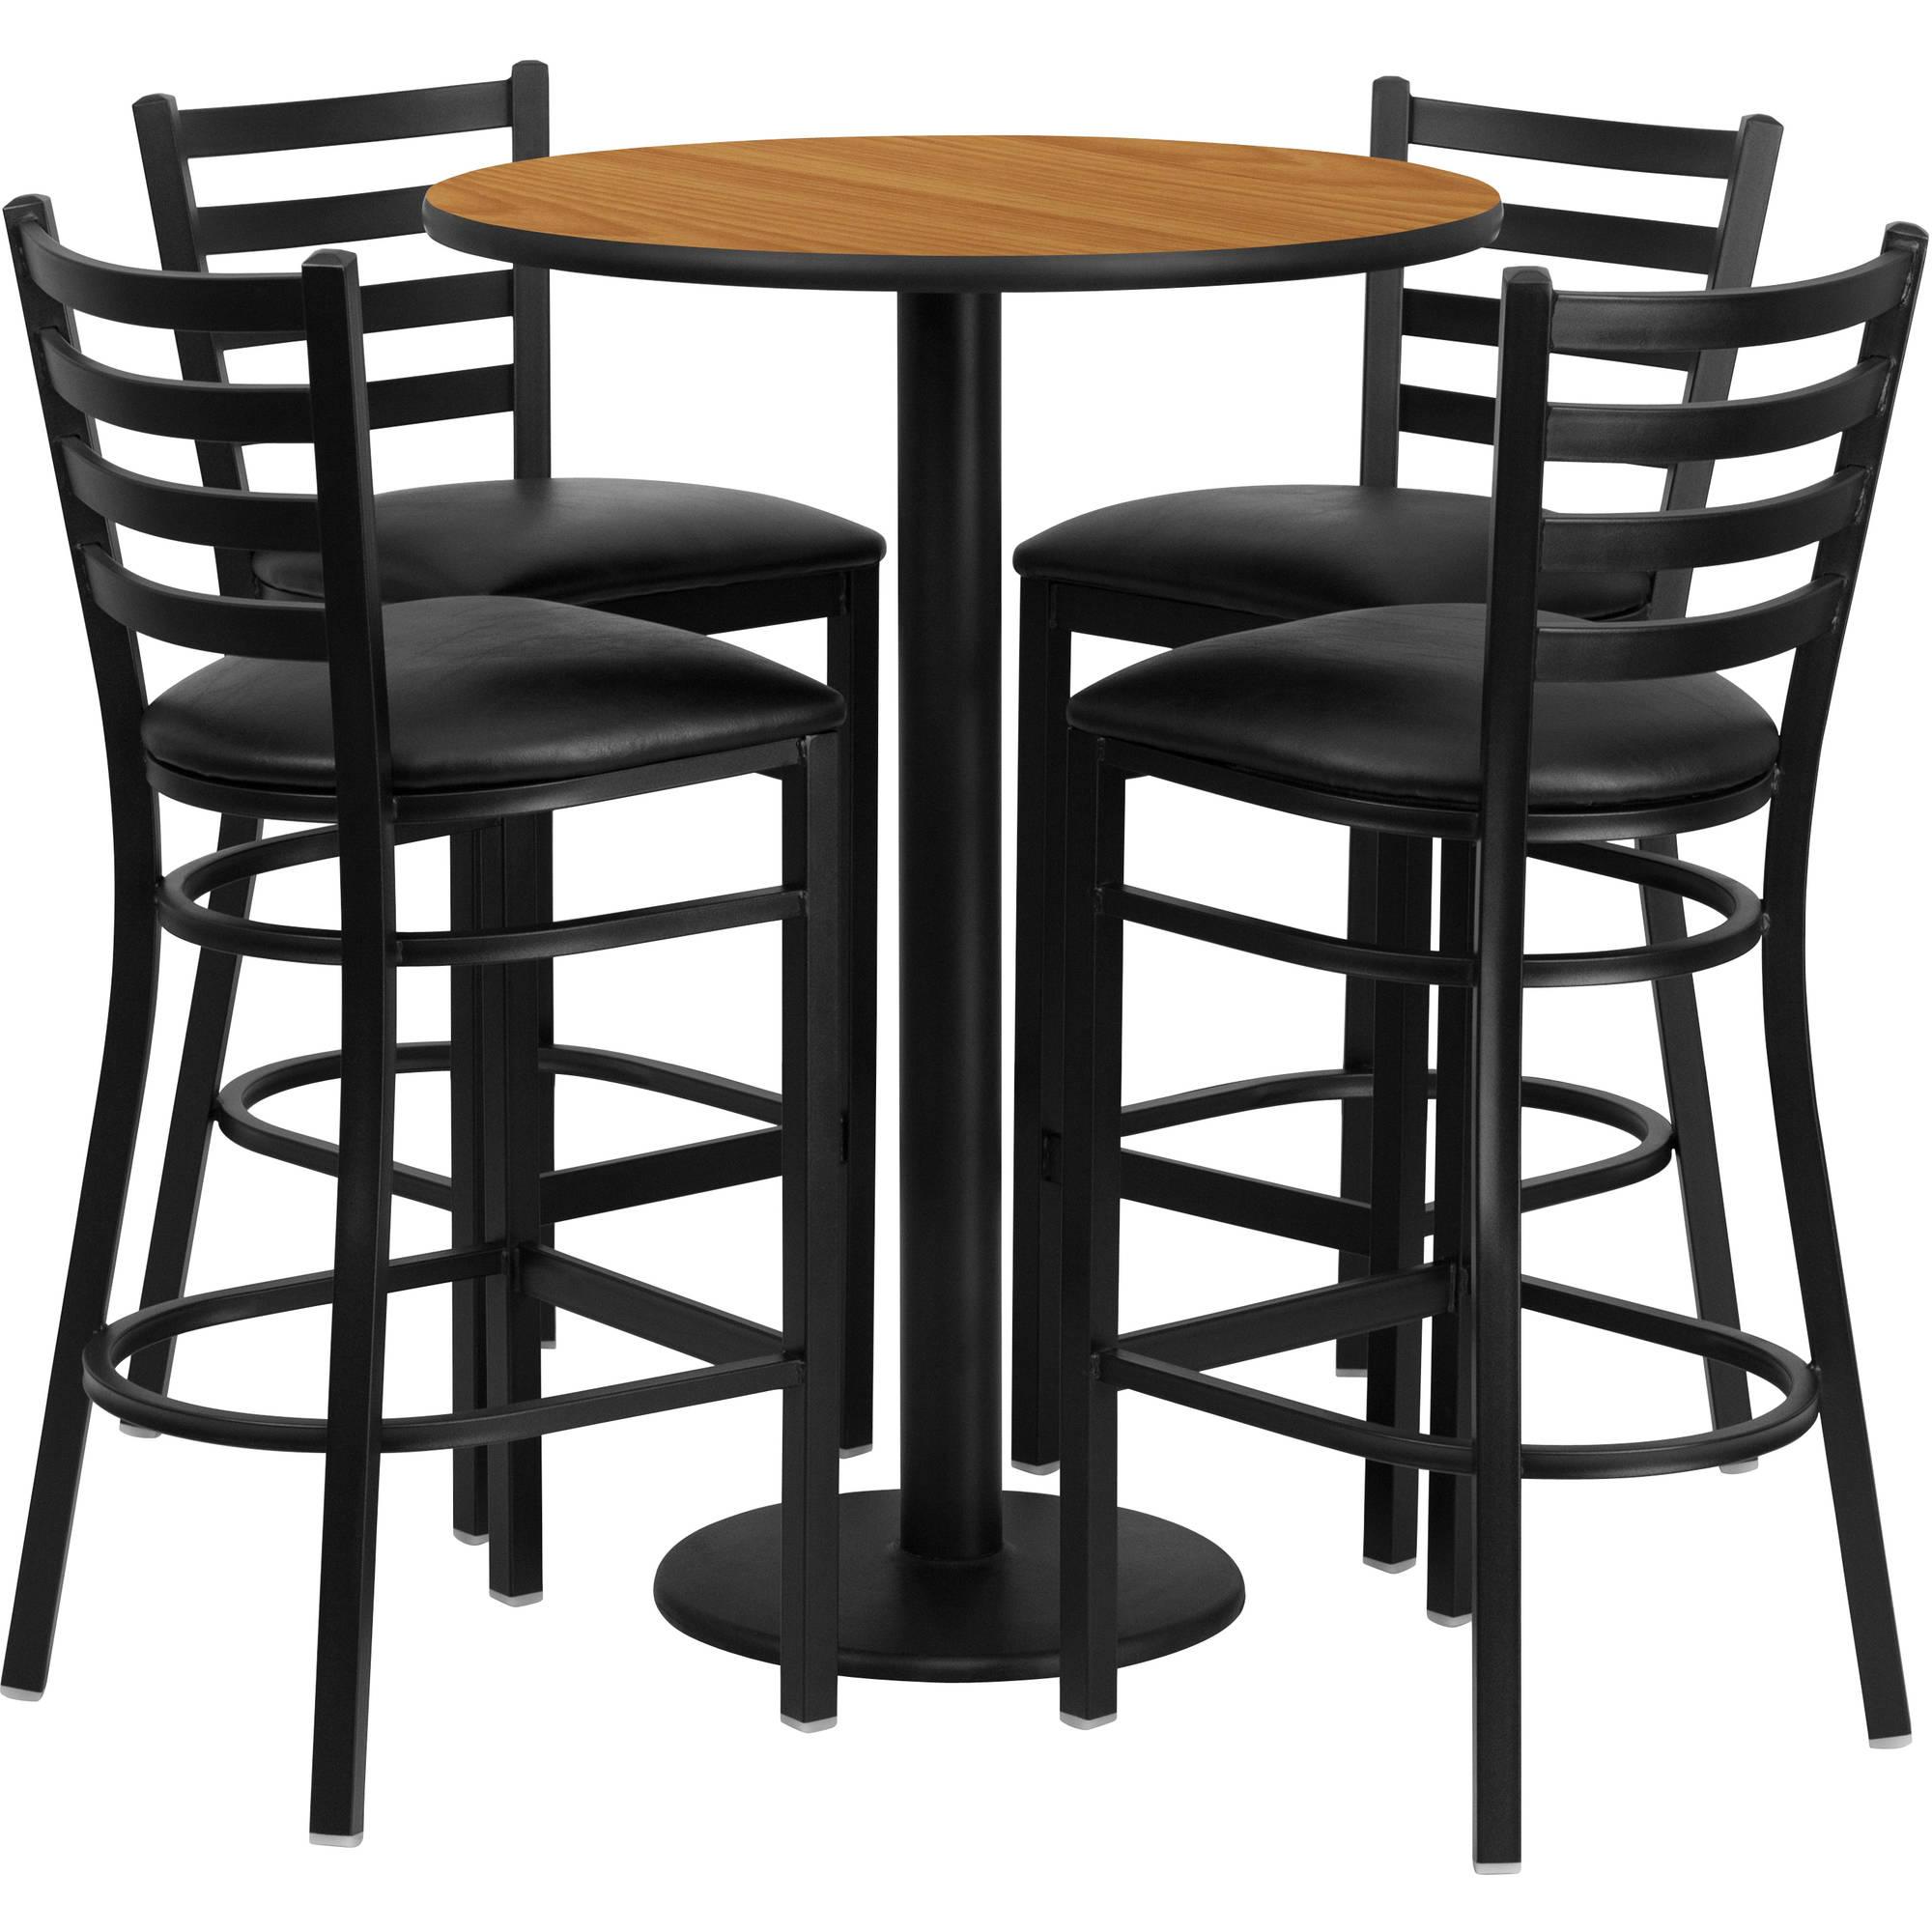 Flash Furniture 30'' Round Natural Laminate Table Set with 4 Ladder Back Metal Barstools, Black Vinyl Seat